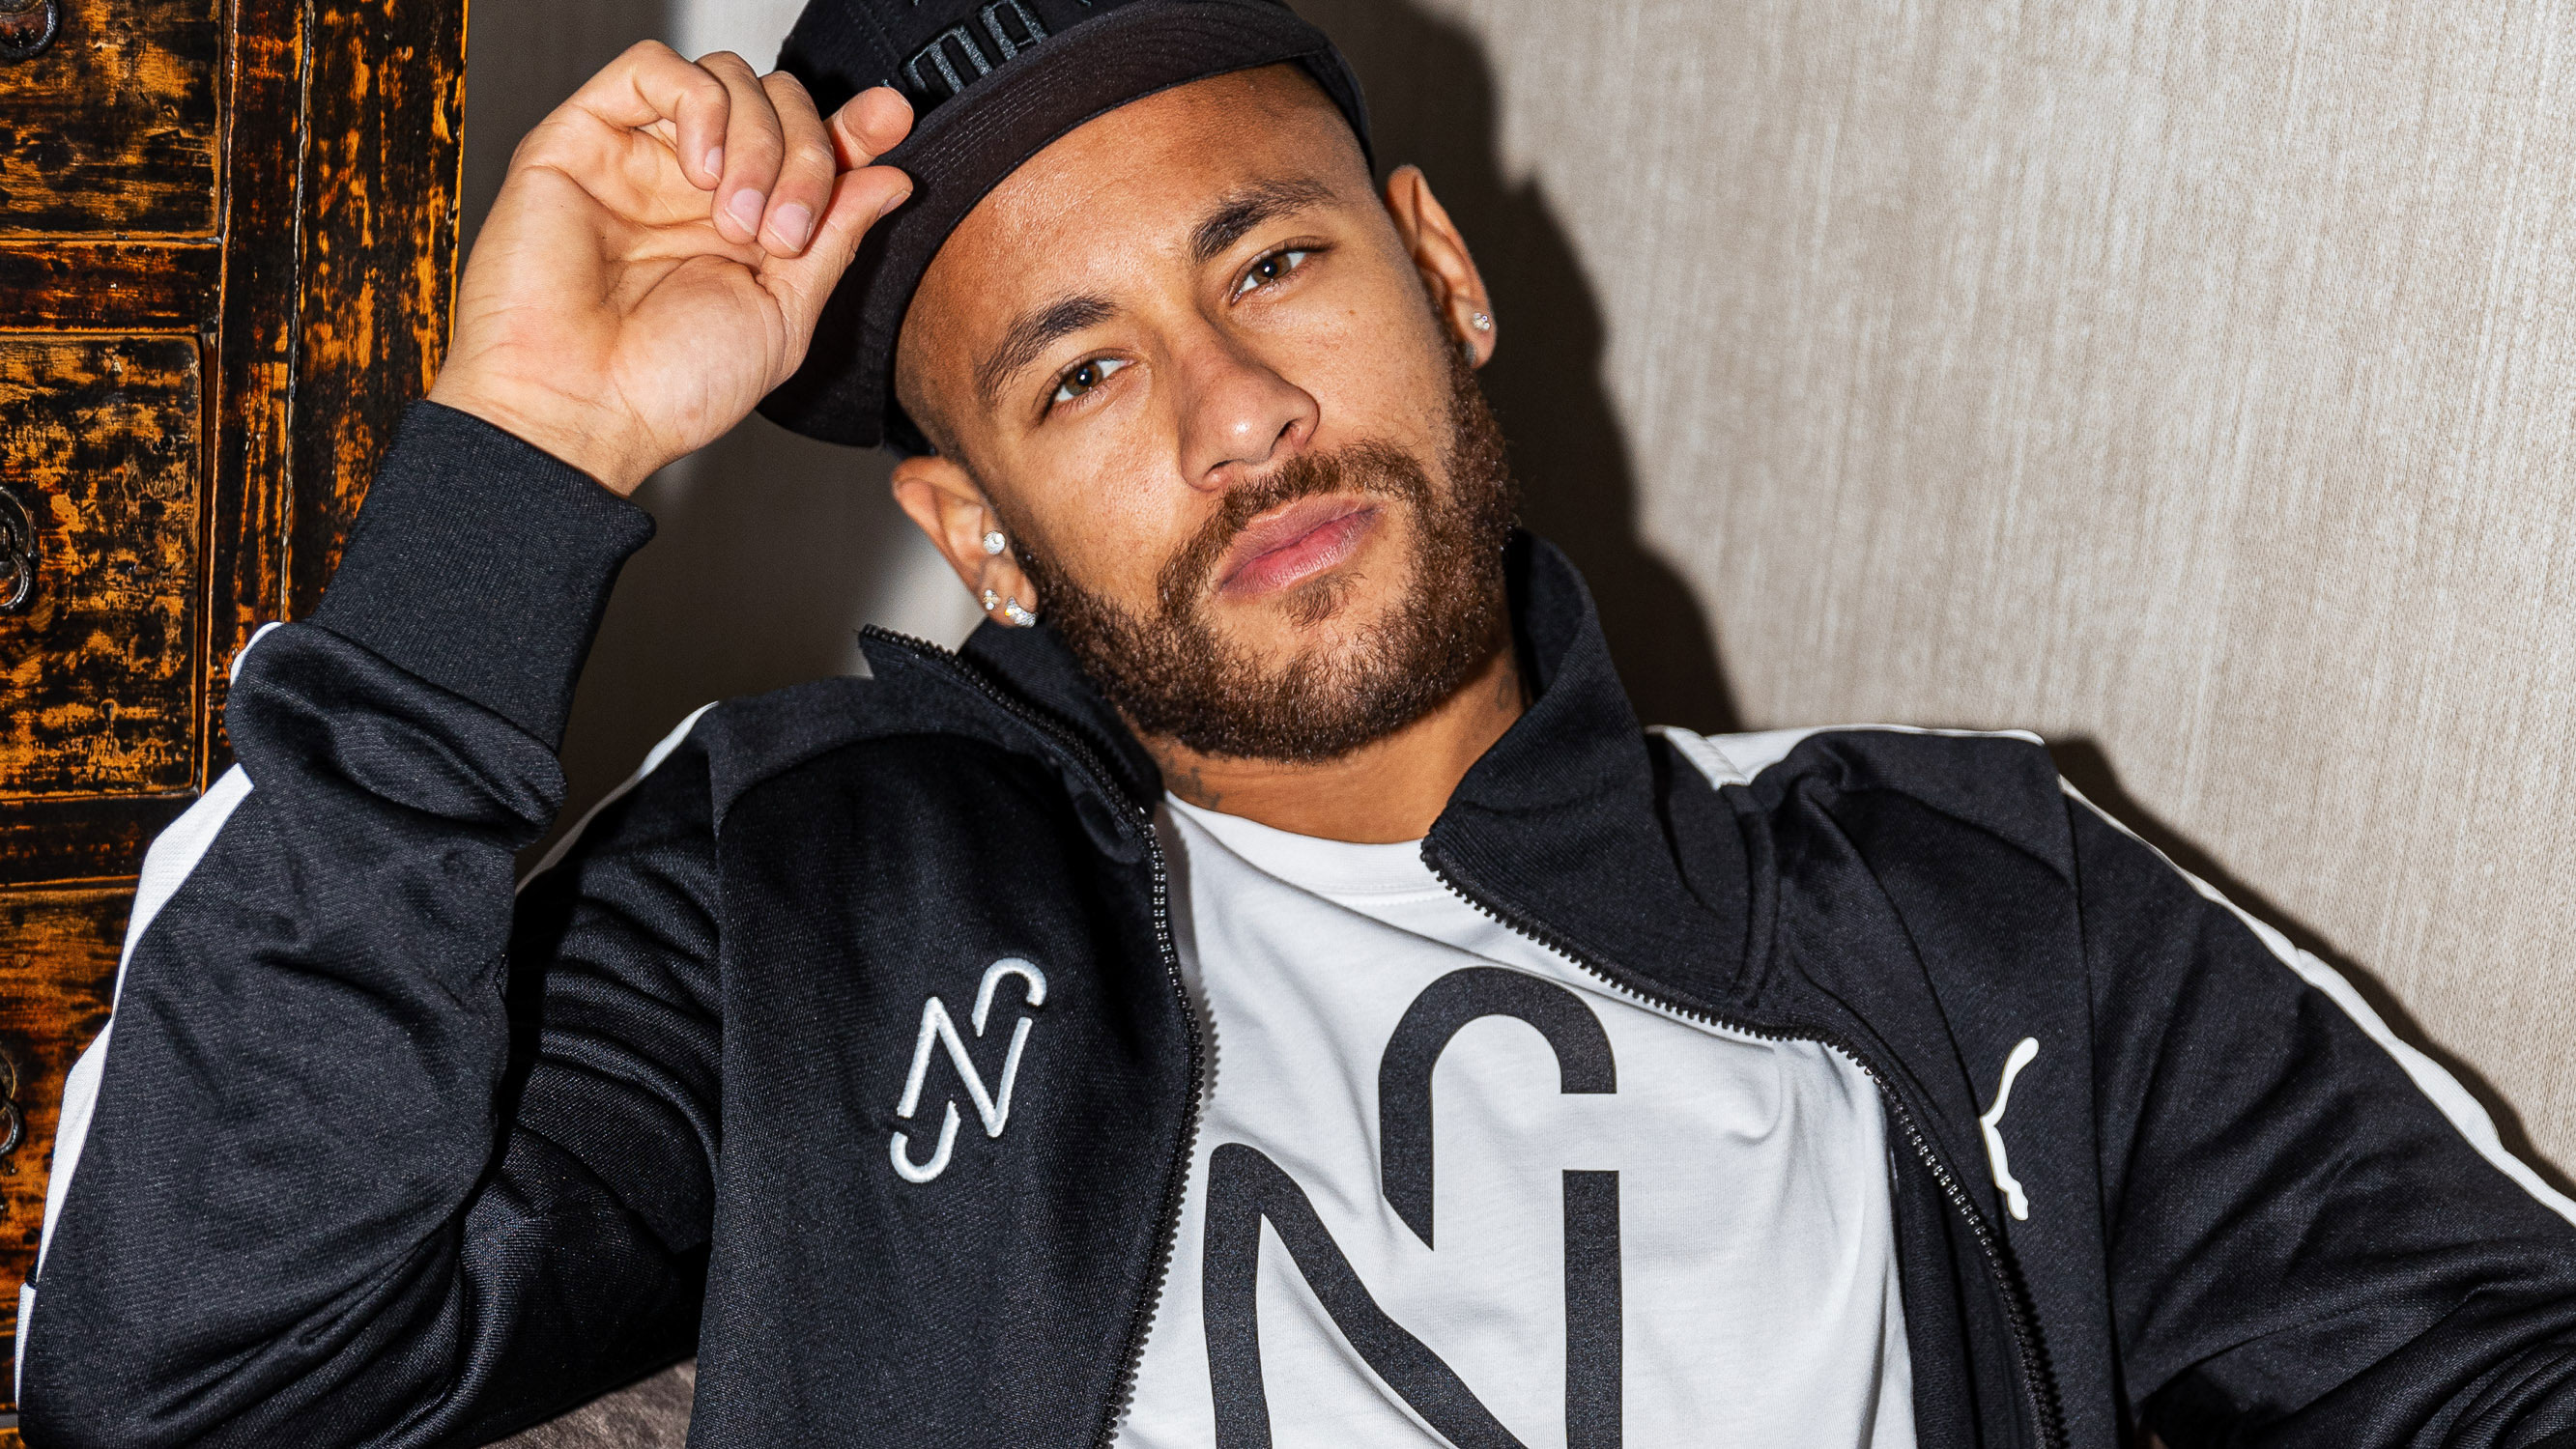 Neymar Jr x PUMA products are already on sale | Neymar Jr.